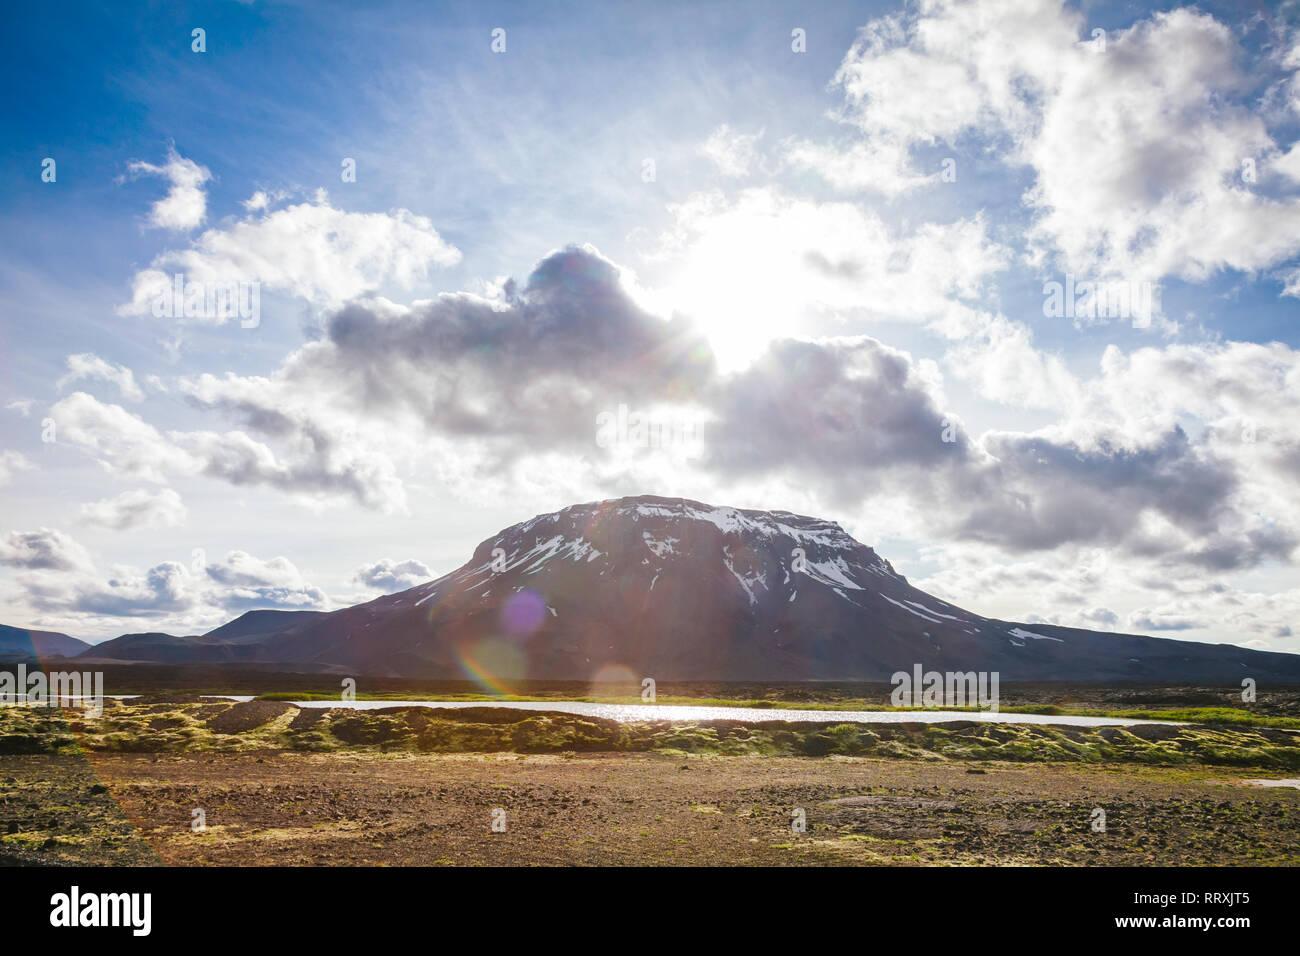 Herdubreid tuya (flat-topped steep-sided volcano) mountain in Ódáðahraun lava field Highlands of Iceland Northeast Iceland, Scandinavia, with lens fla - Stock Image